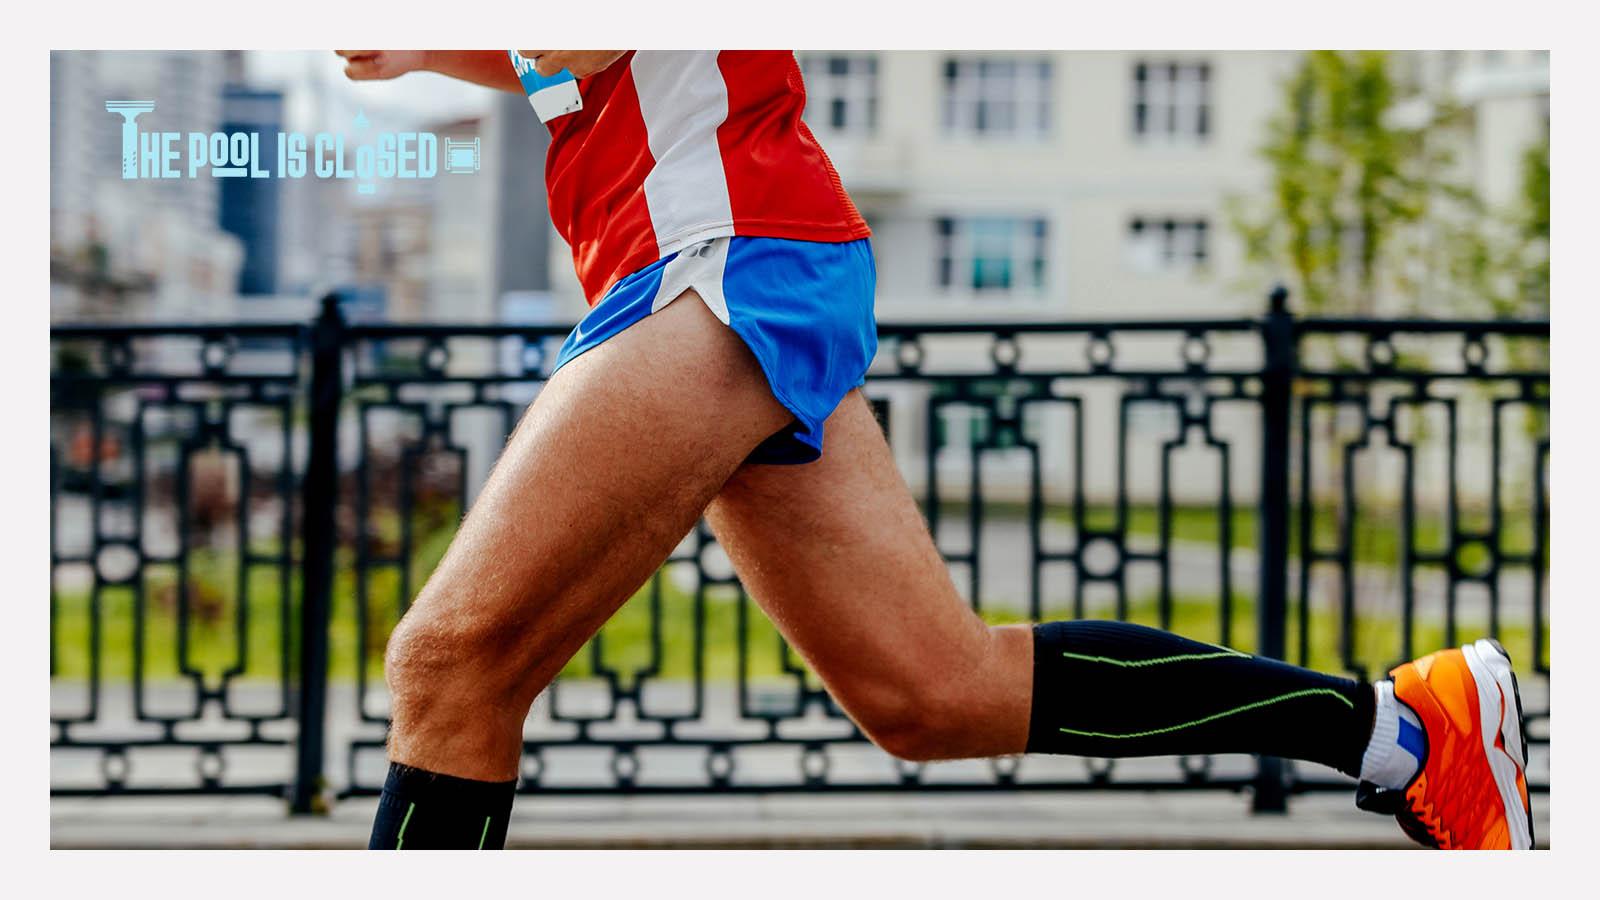 man running a marathon – turnipstyle – thepoolisclosed.com